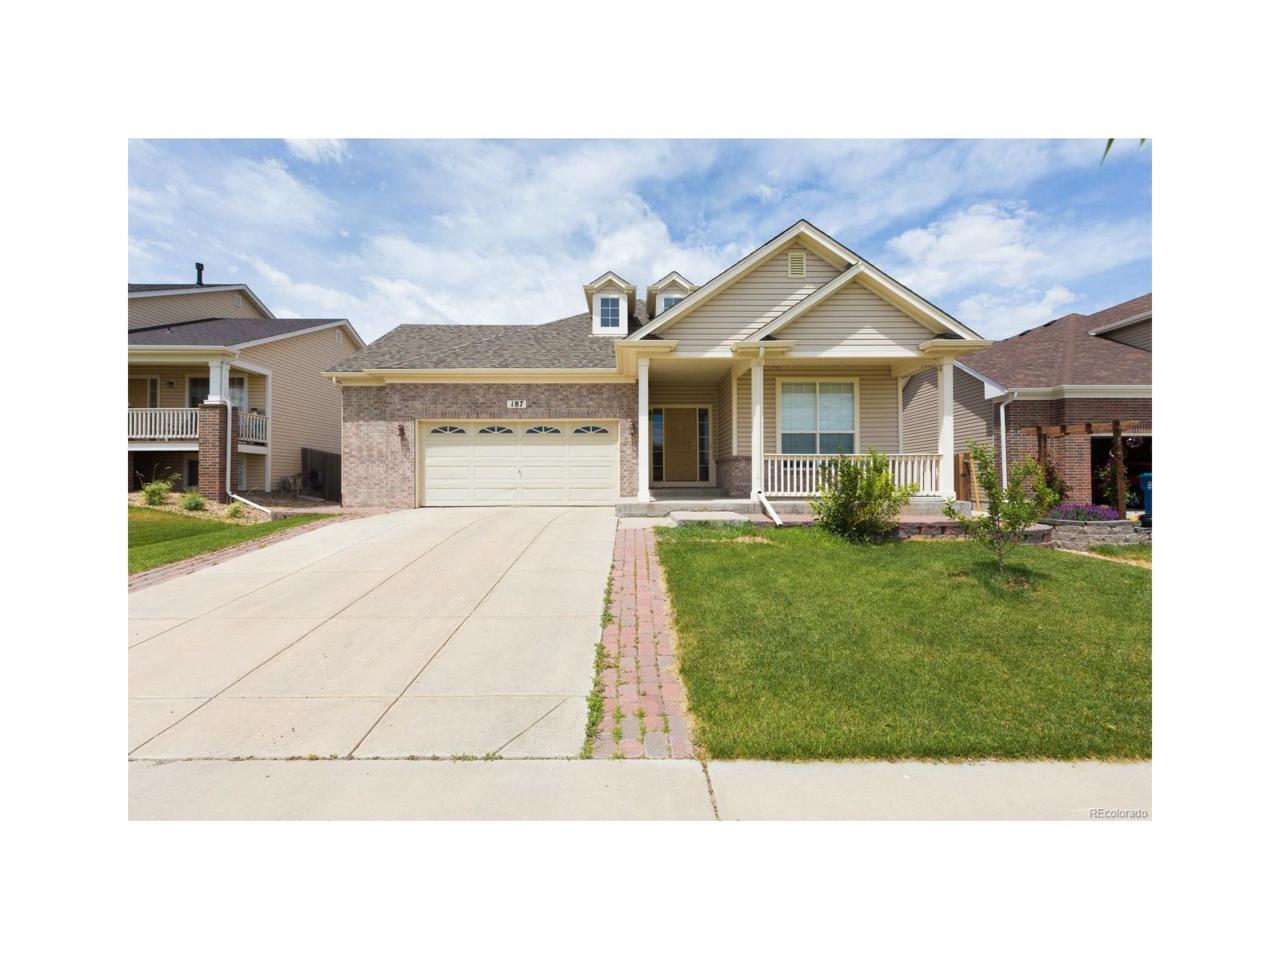 187 N 45th Avenue, Brighton, CO 80601 (MLS #7941279) :: 8z Real Estate